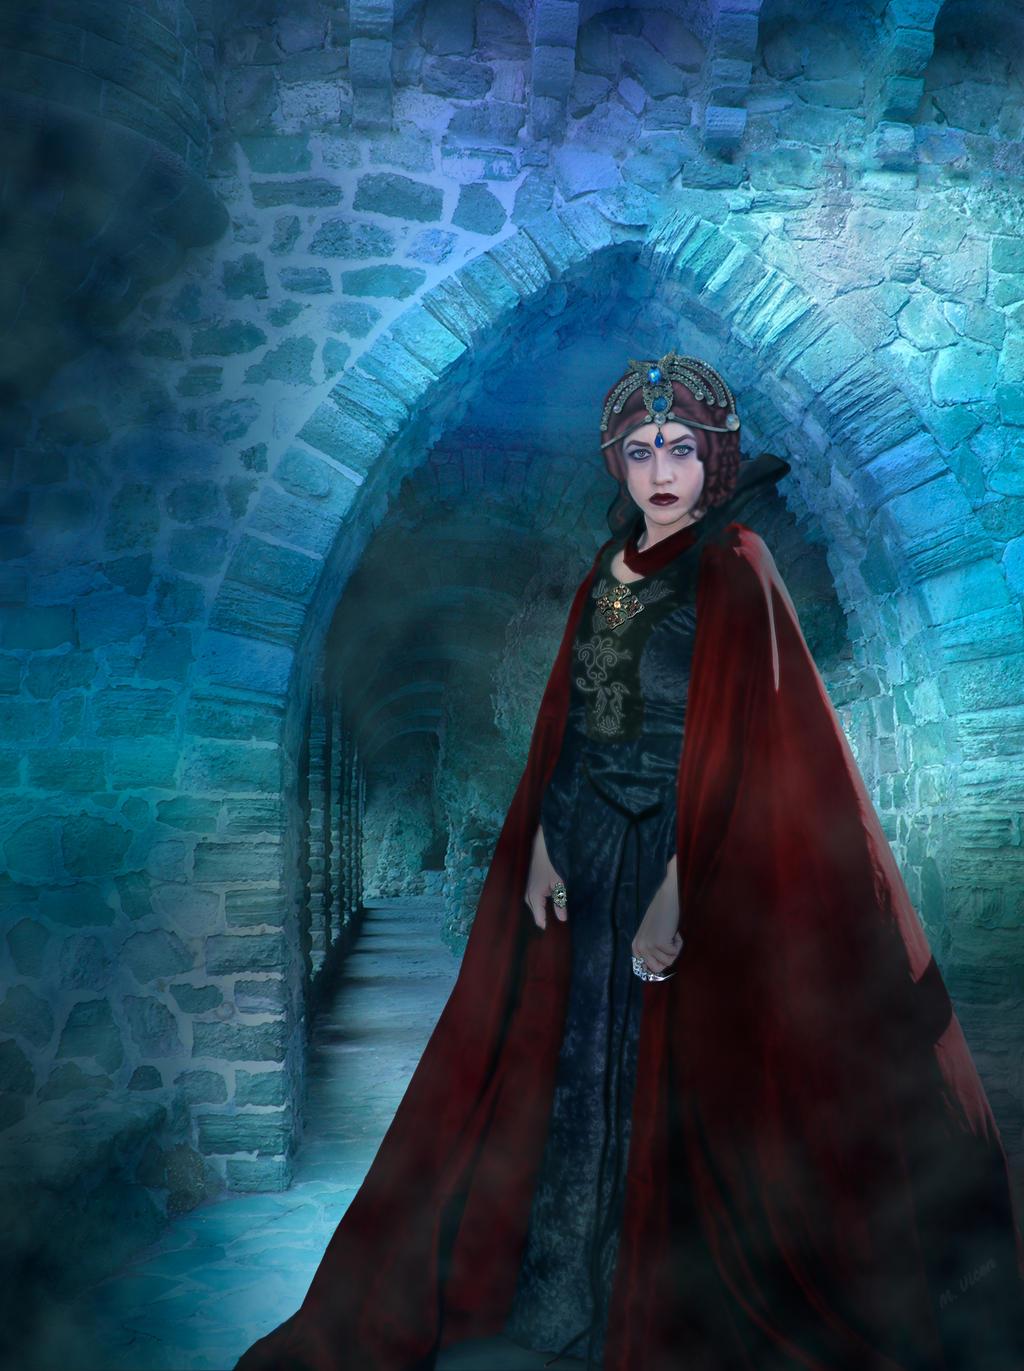 Evil Queen-Reina Malvada by Mvicen